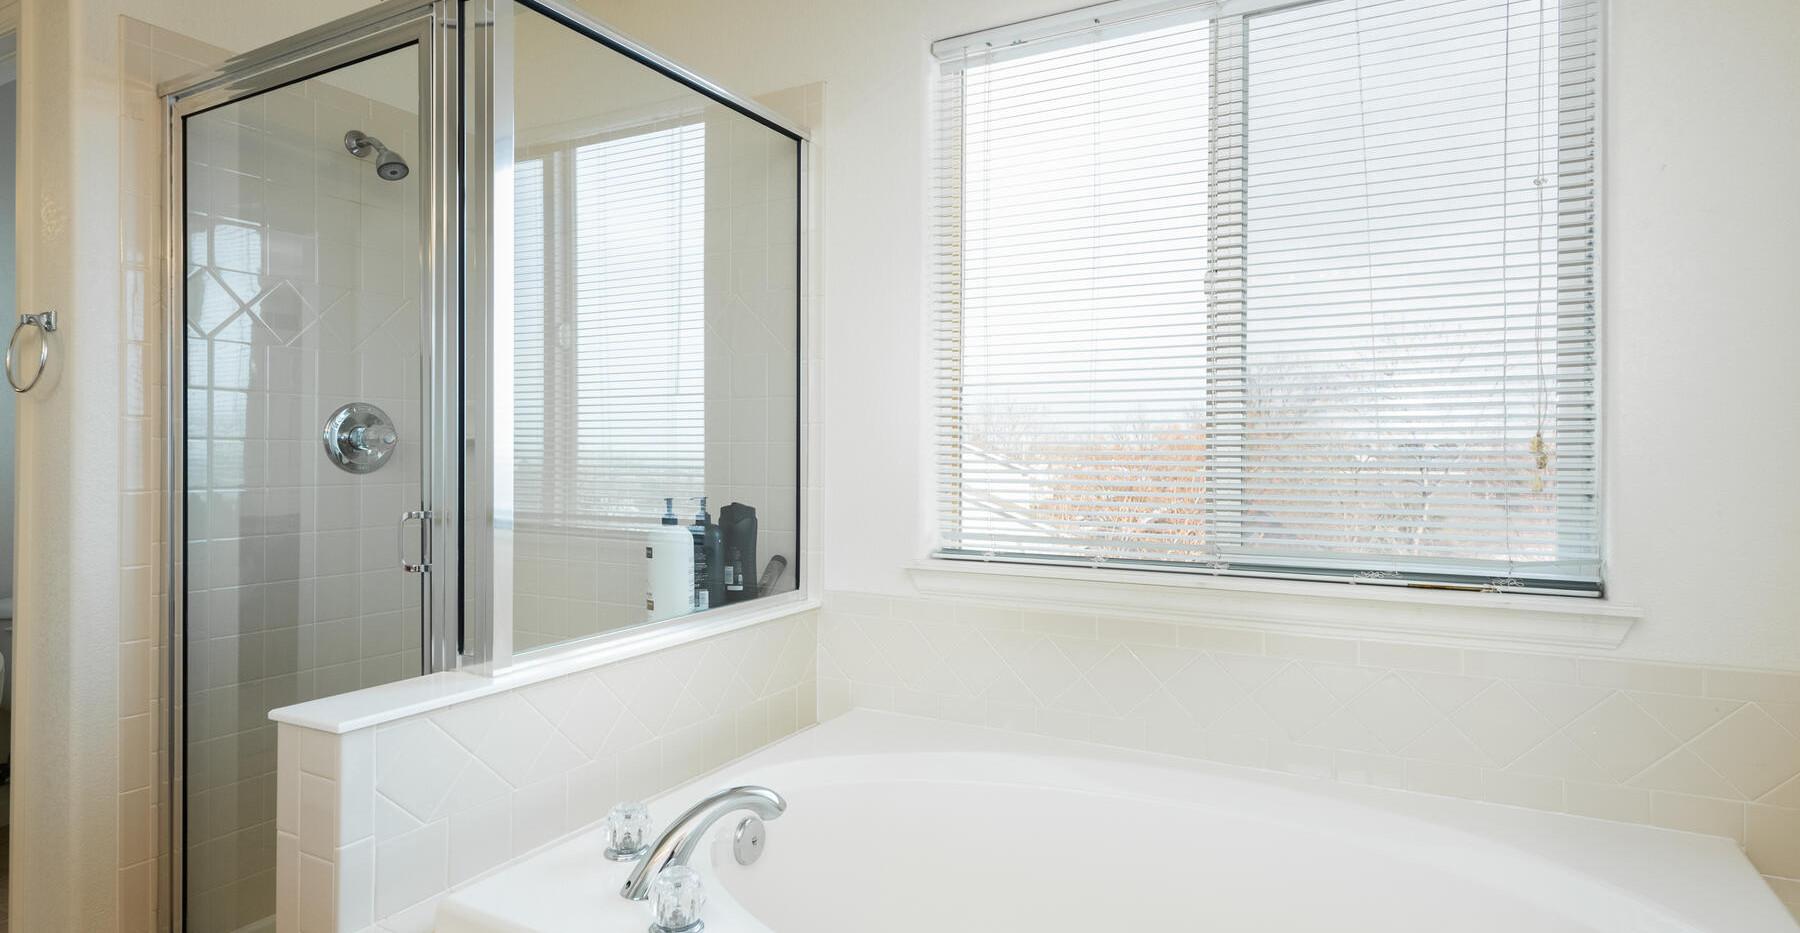 2112 W 101st Circle-032-037-Bathroom-MLS